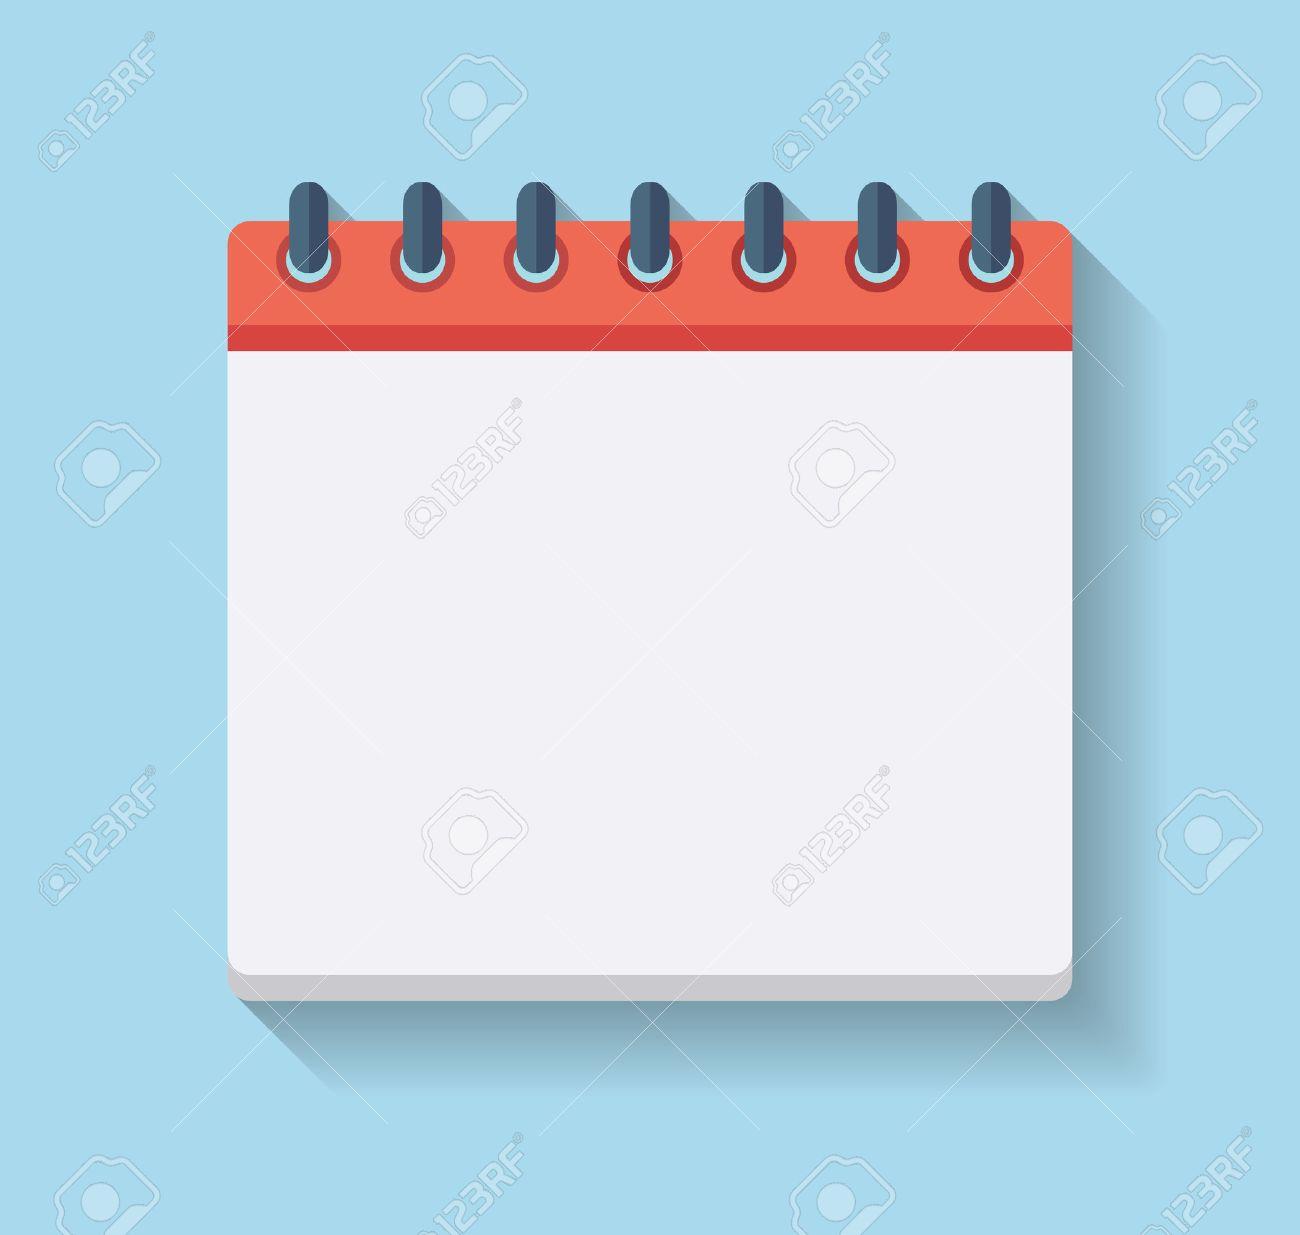 Flat Calendar Icon. Blank Calendar Template. Royalty Free Cliparts ...